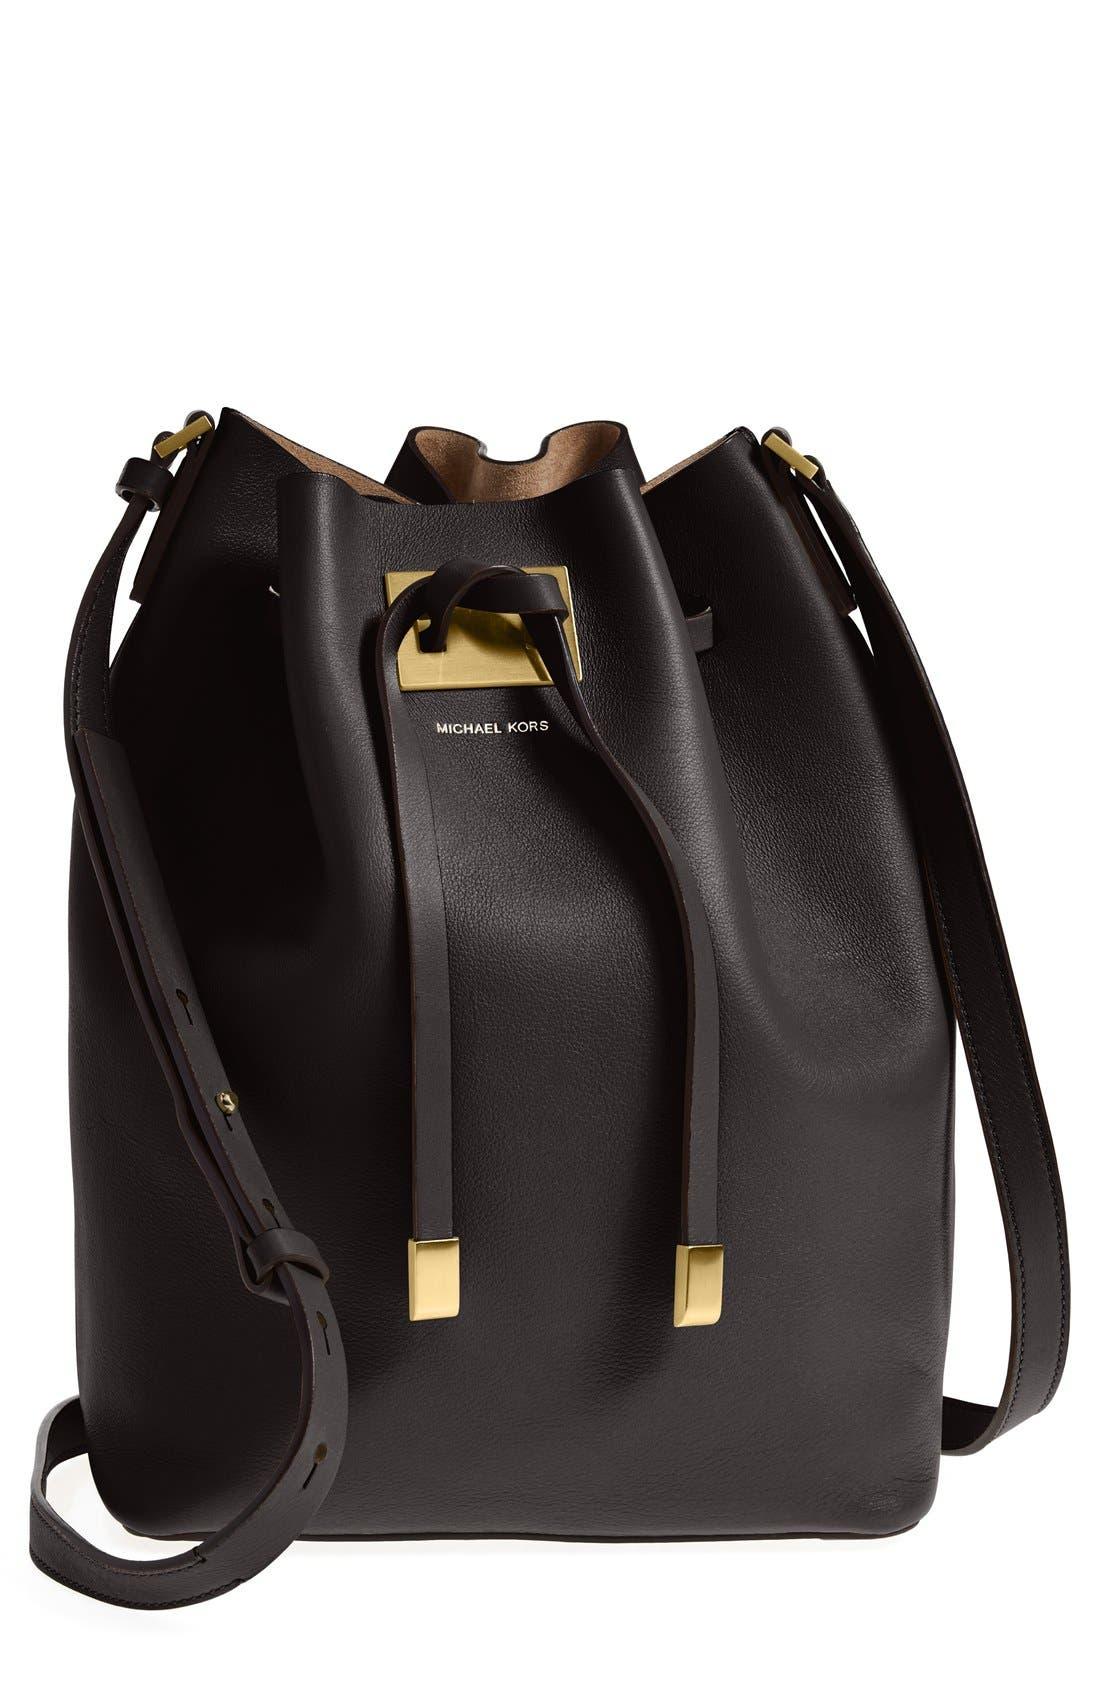 Main Image - Michael Kors 'Large Miranda' Leather Bucket Bag